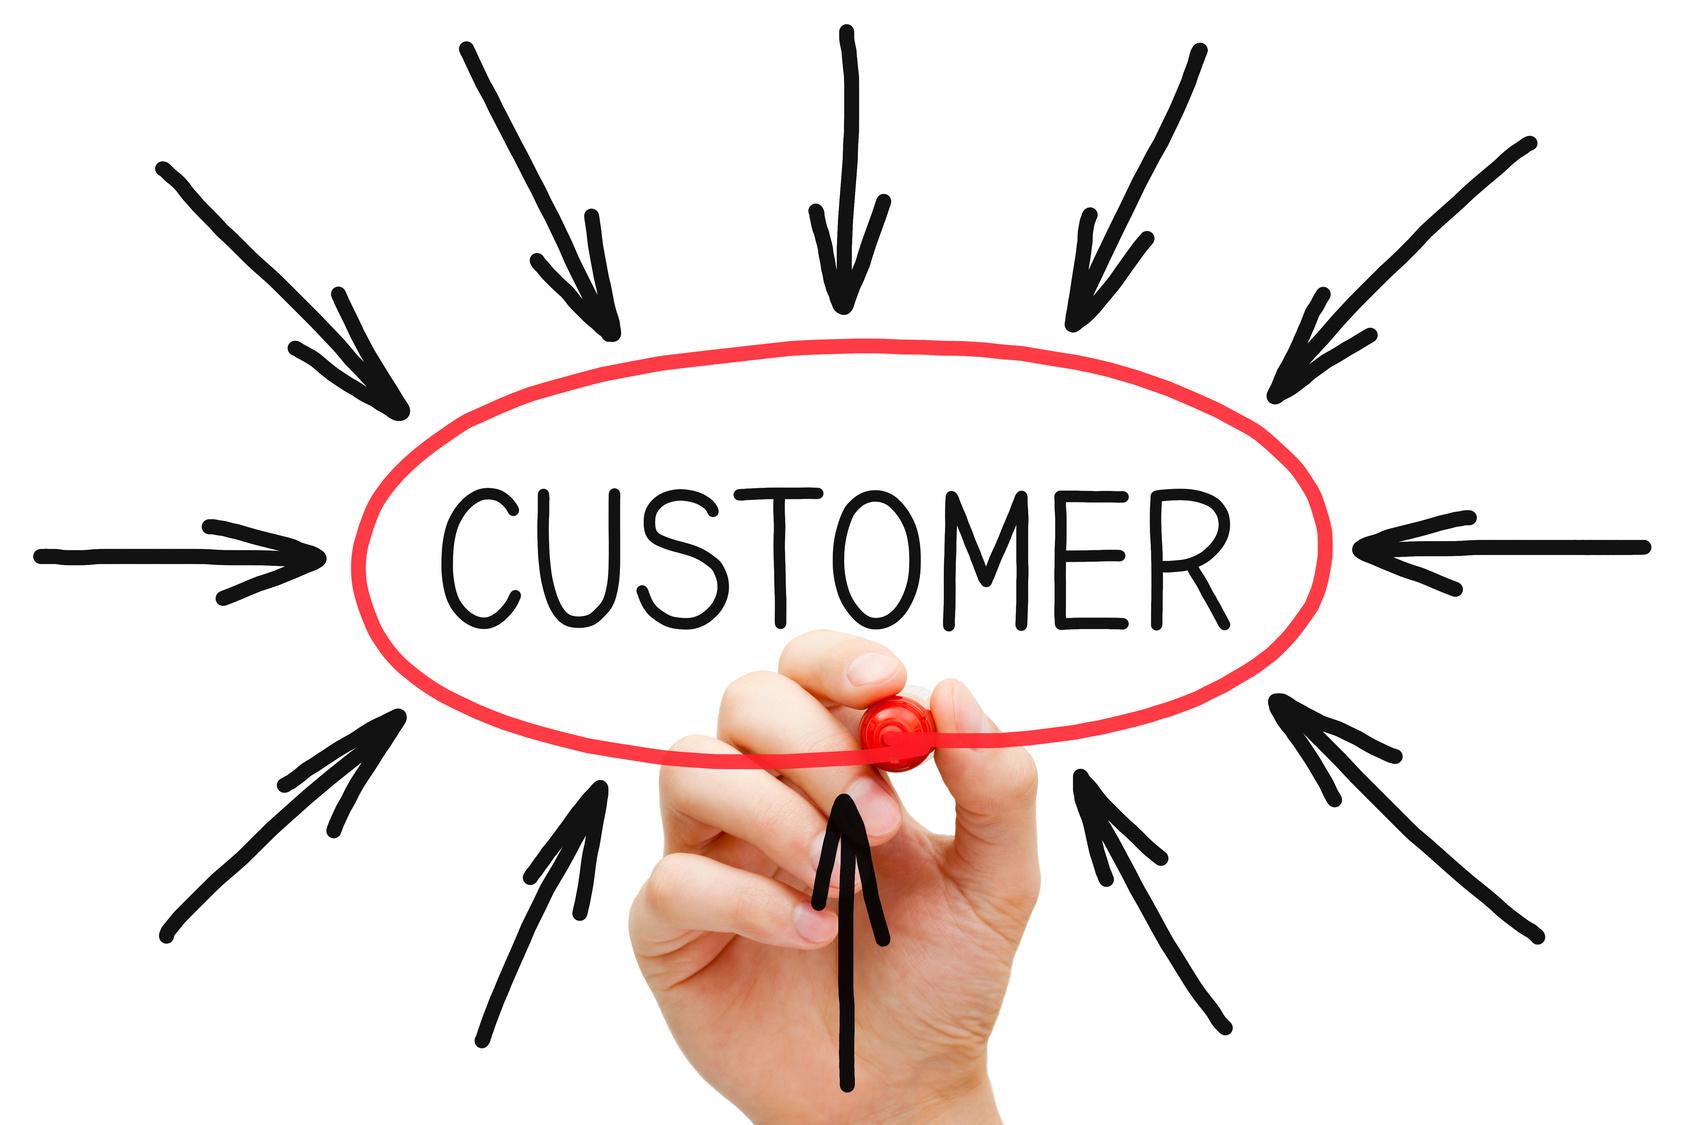 Customer vector freeuse stock Customer - ClipartFest vector freeuse stock